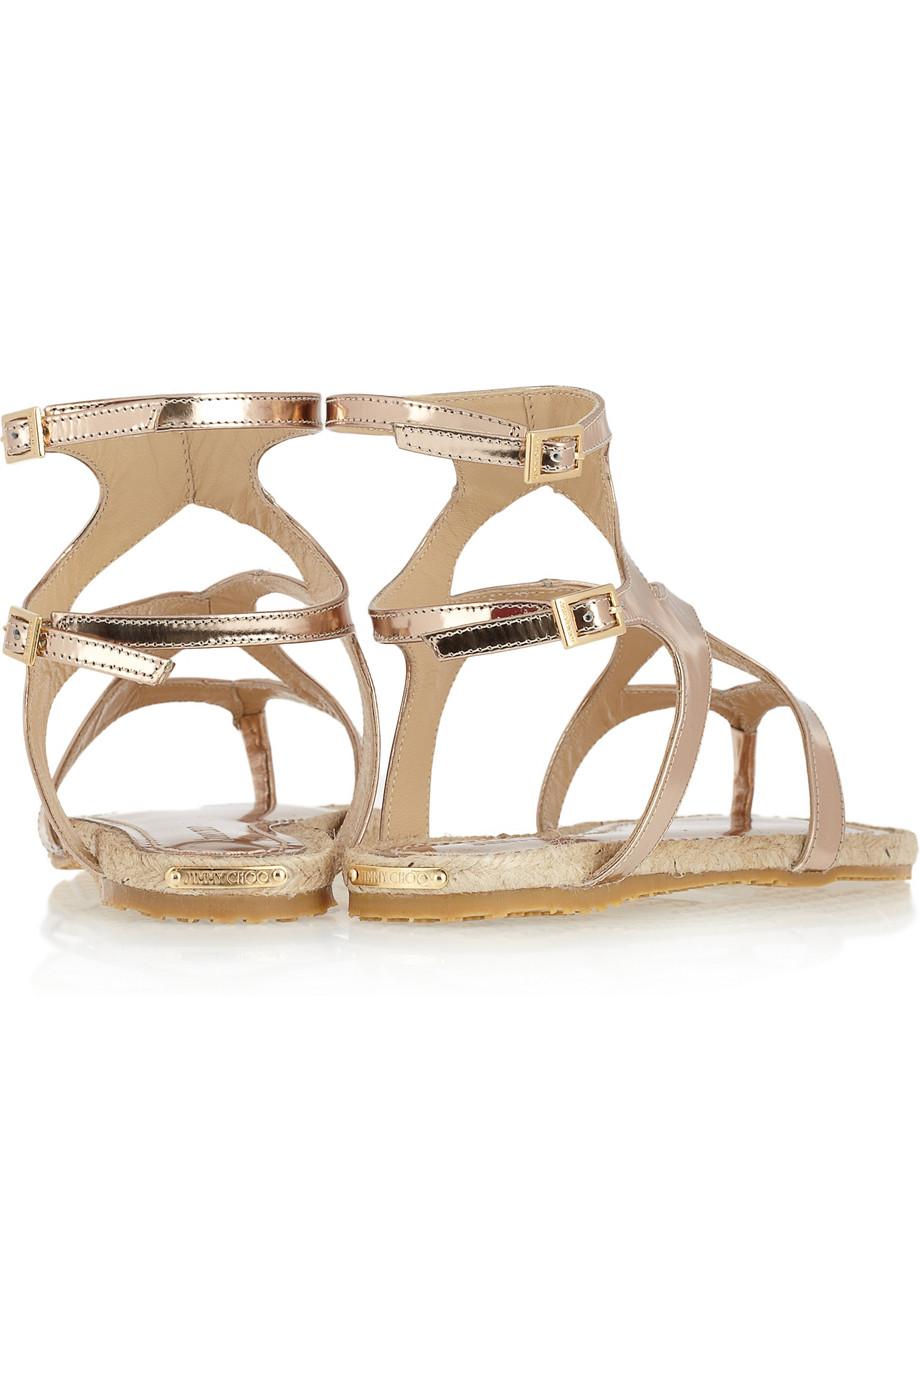 d58899ef2ed0 Lyst - Jimmy Choo Peachy Metallic Leather Gladiator Sandals in Metallic